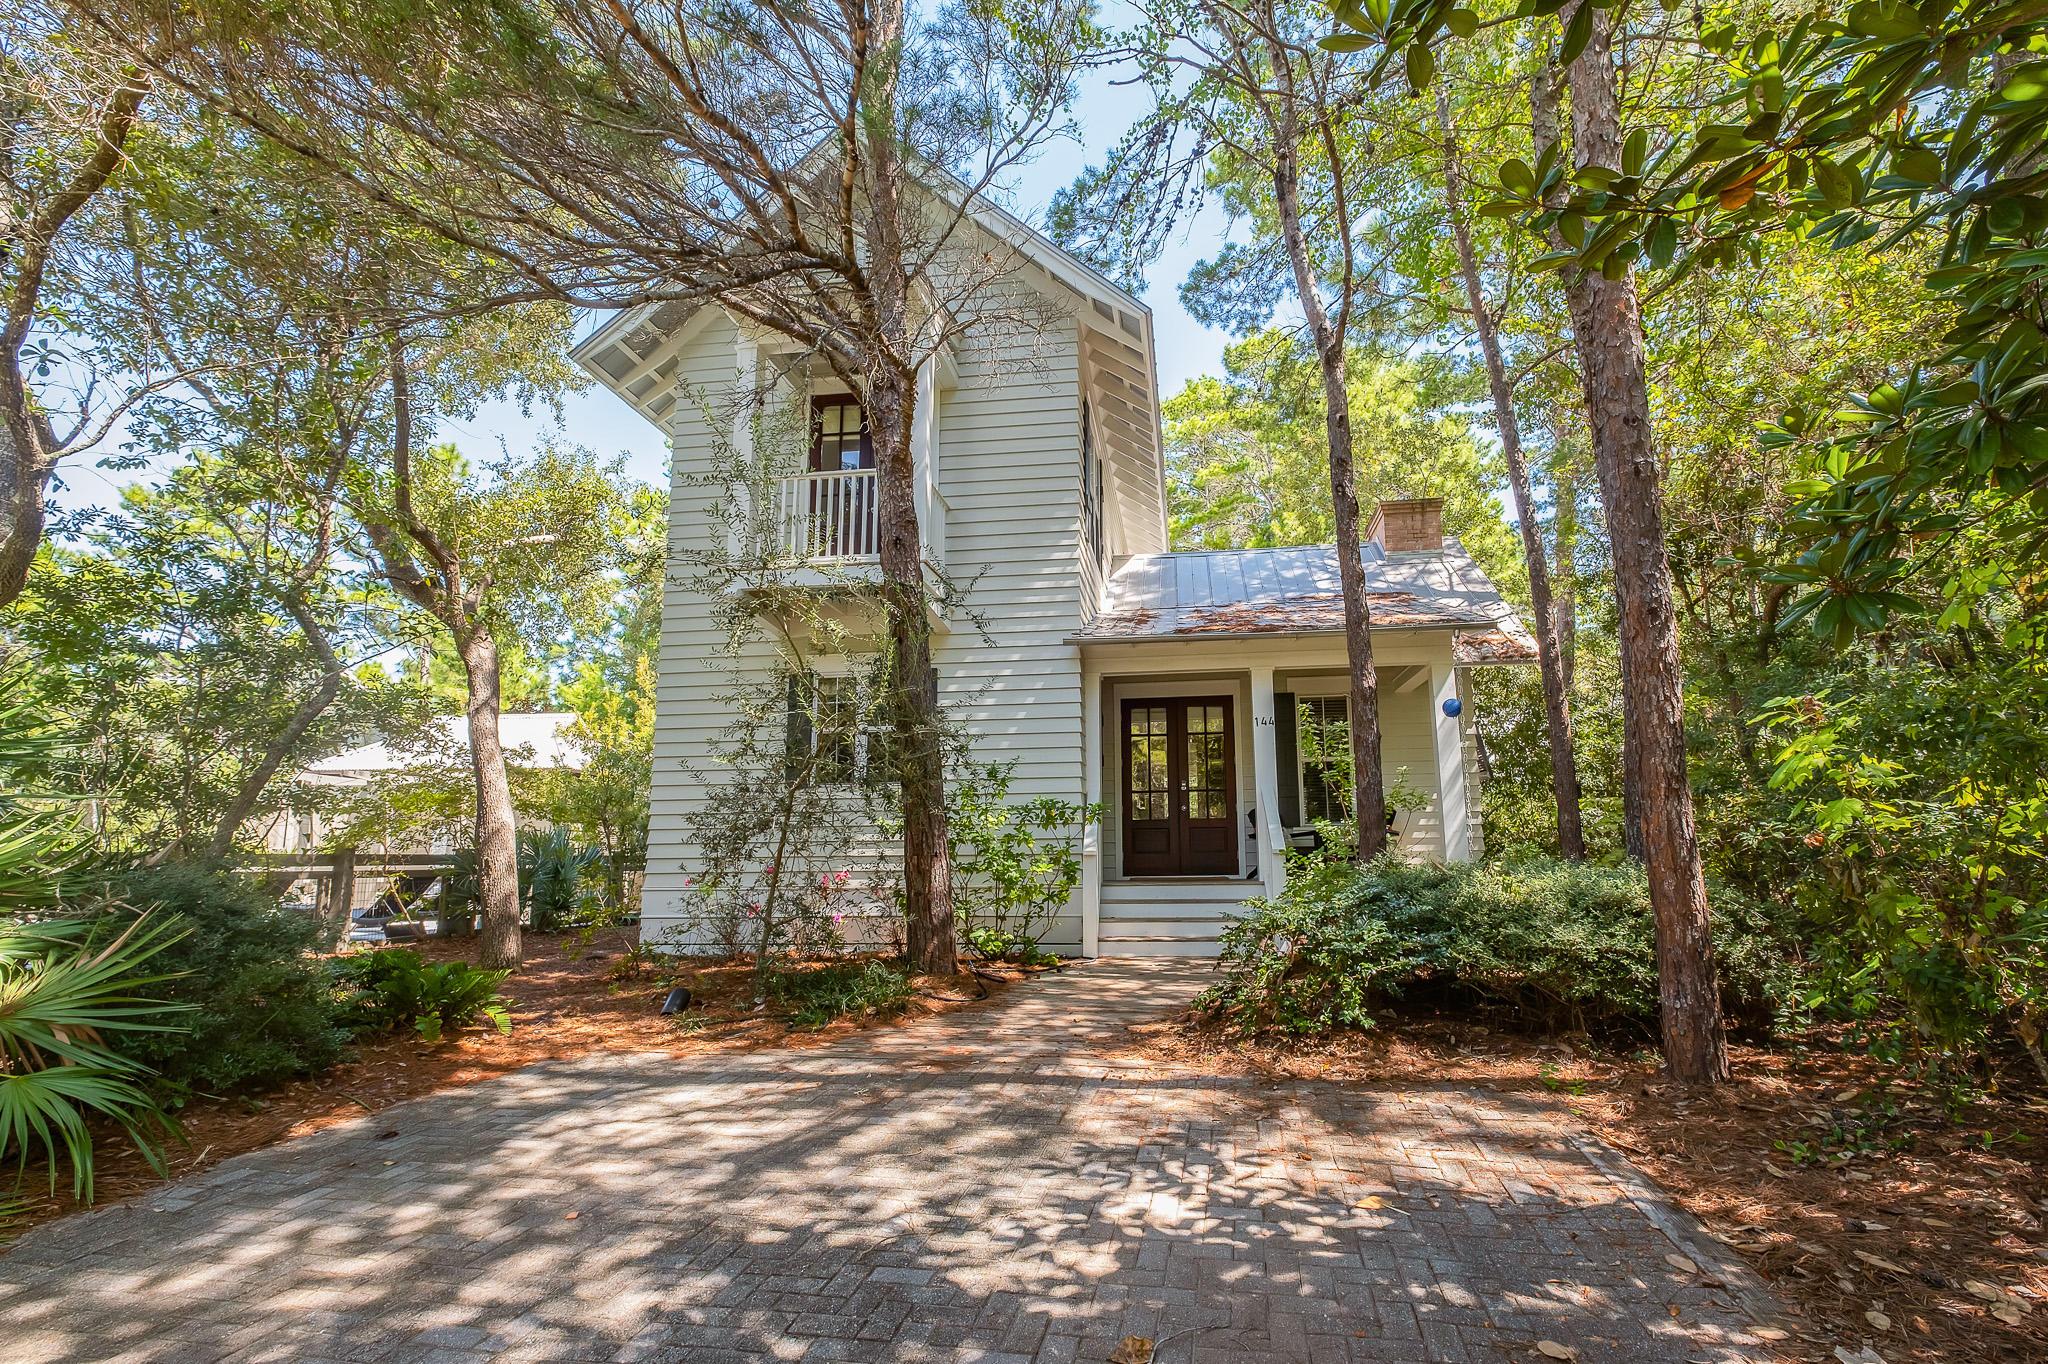 Photo of home for sale at 144 Hammock, Santa Rosa Beach FL